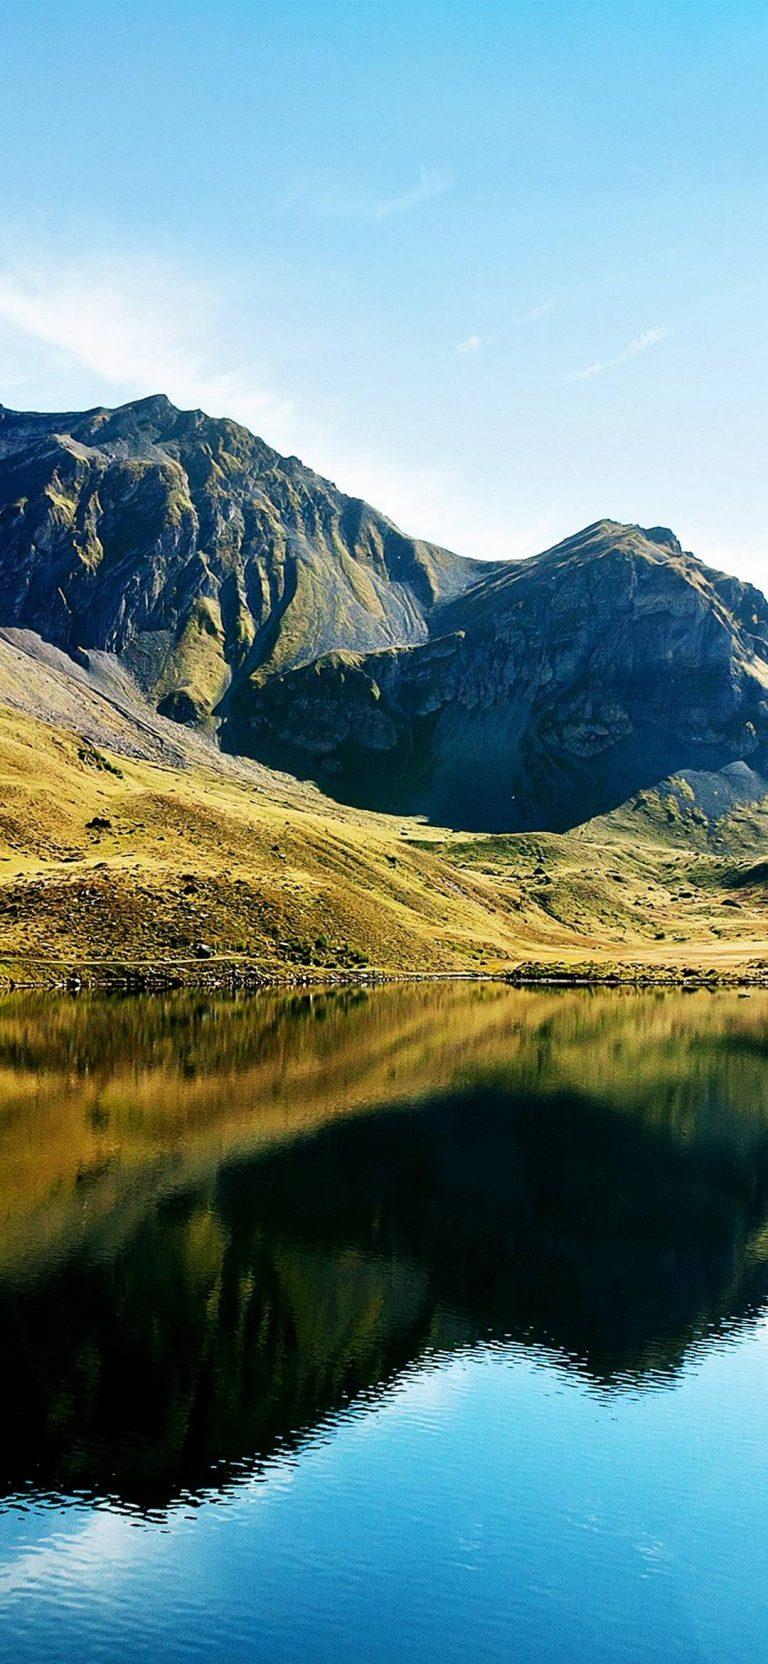 Swiss Alps Lake 1080x2340 768x1664